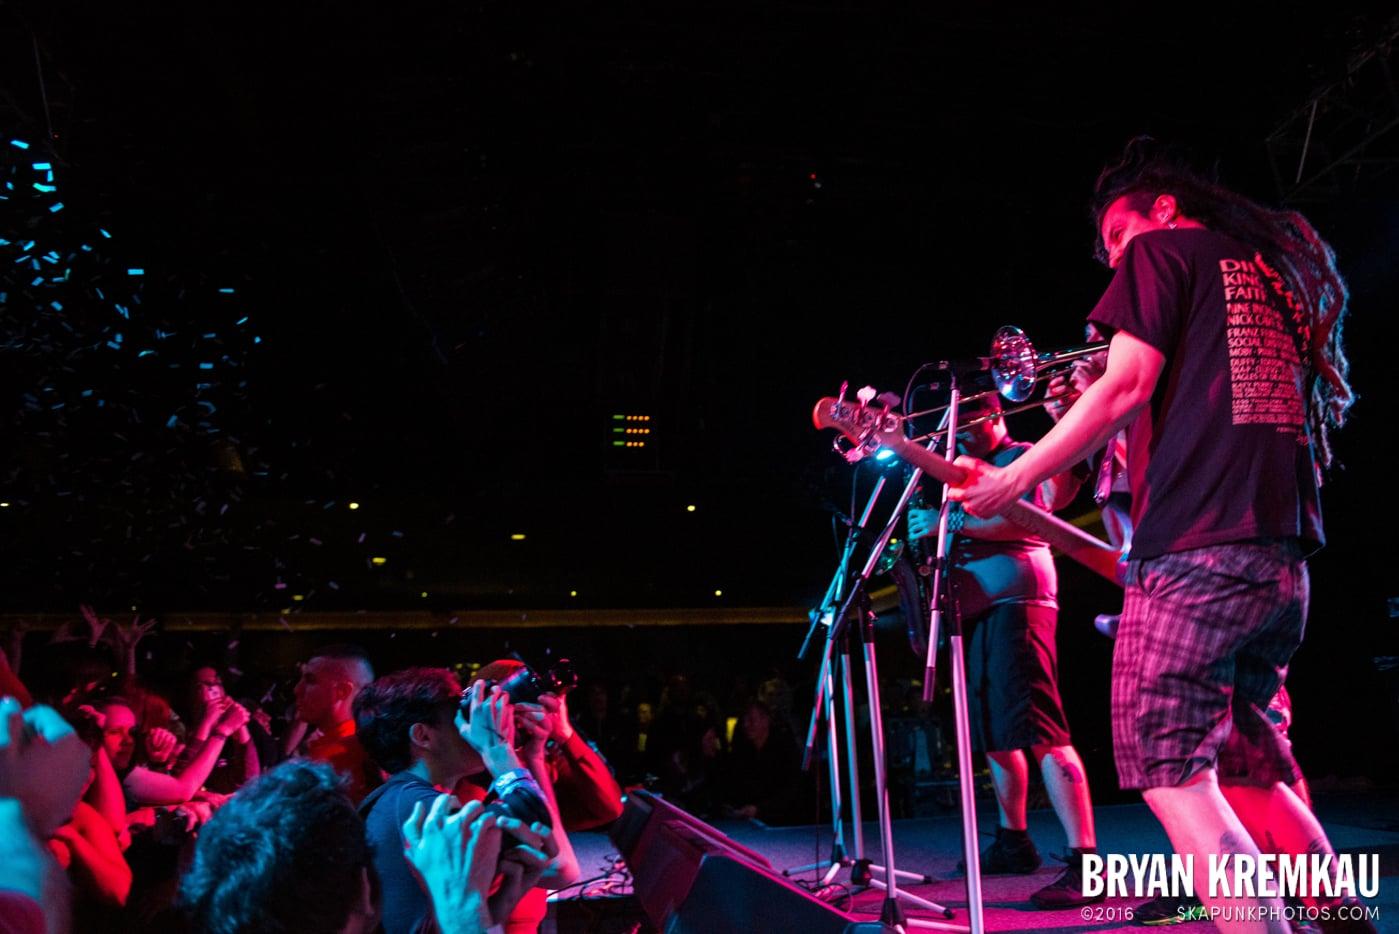 Less Than Jake @ Starland Ballroom, Sayreville, NJ - 11.9.13 (22)